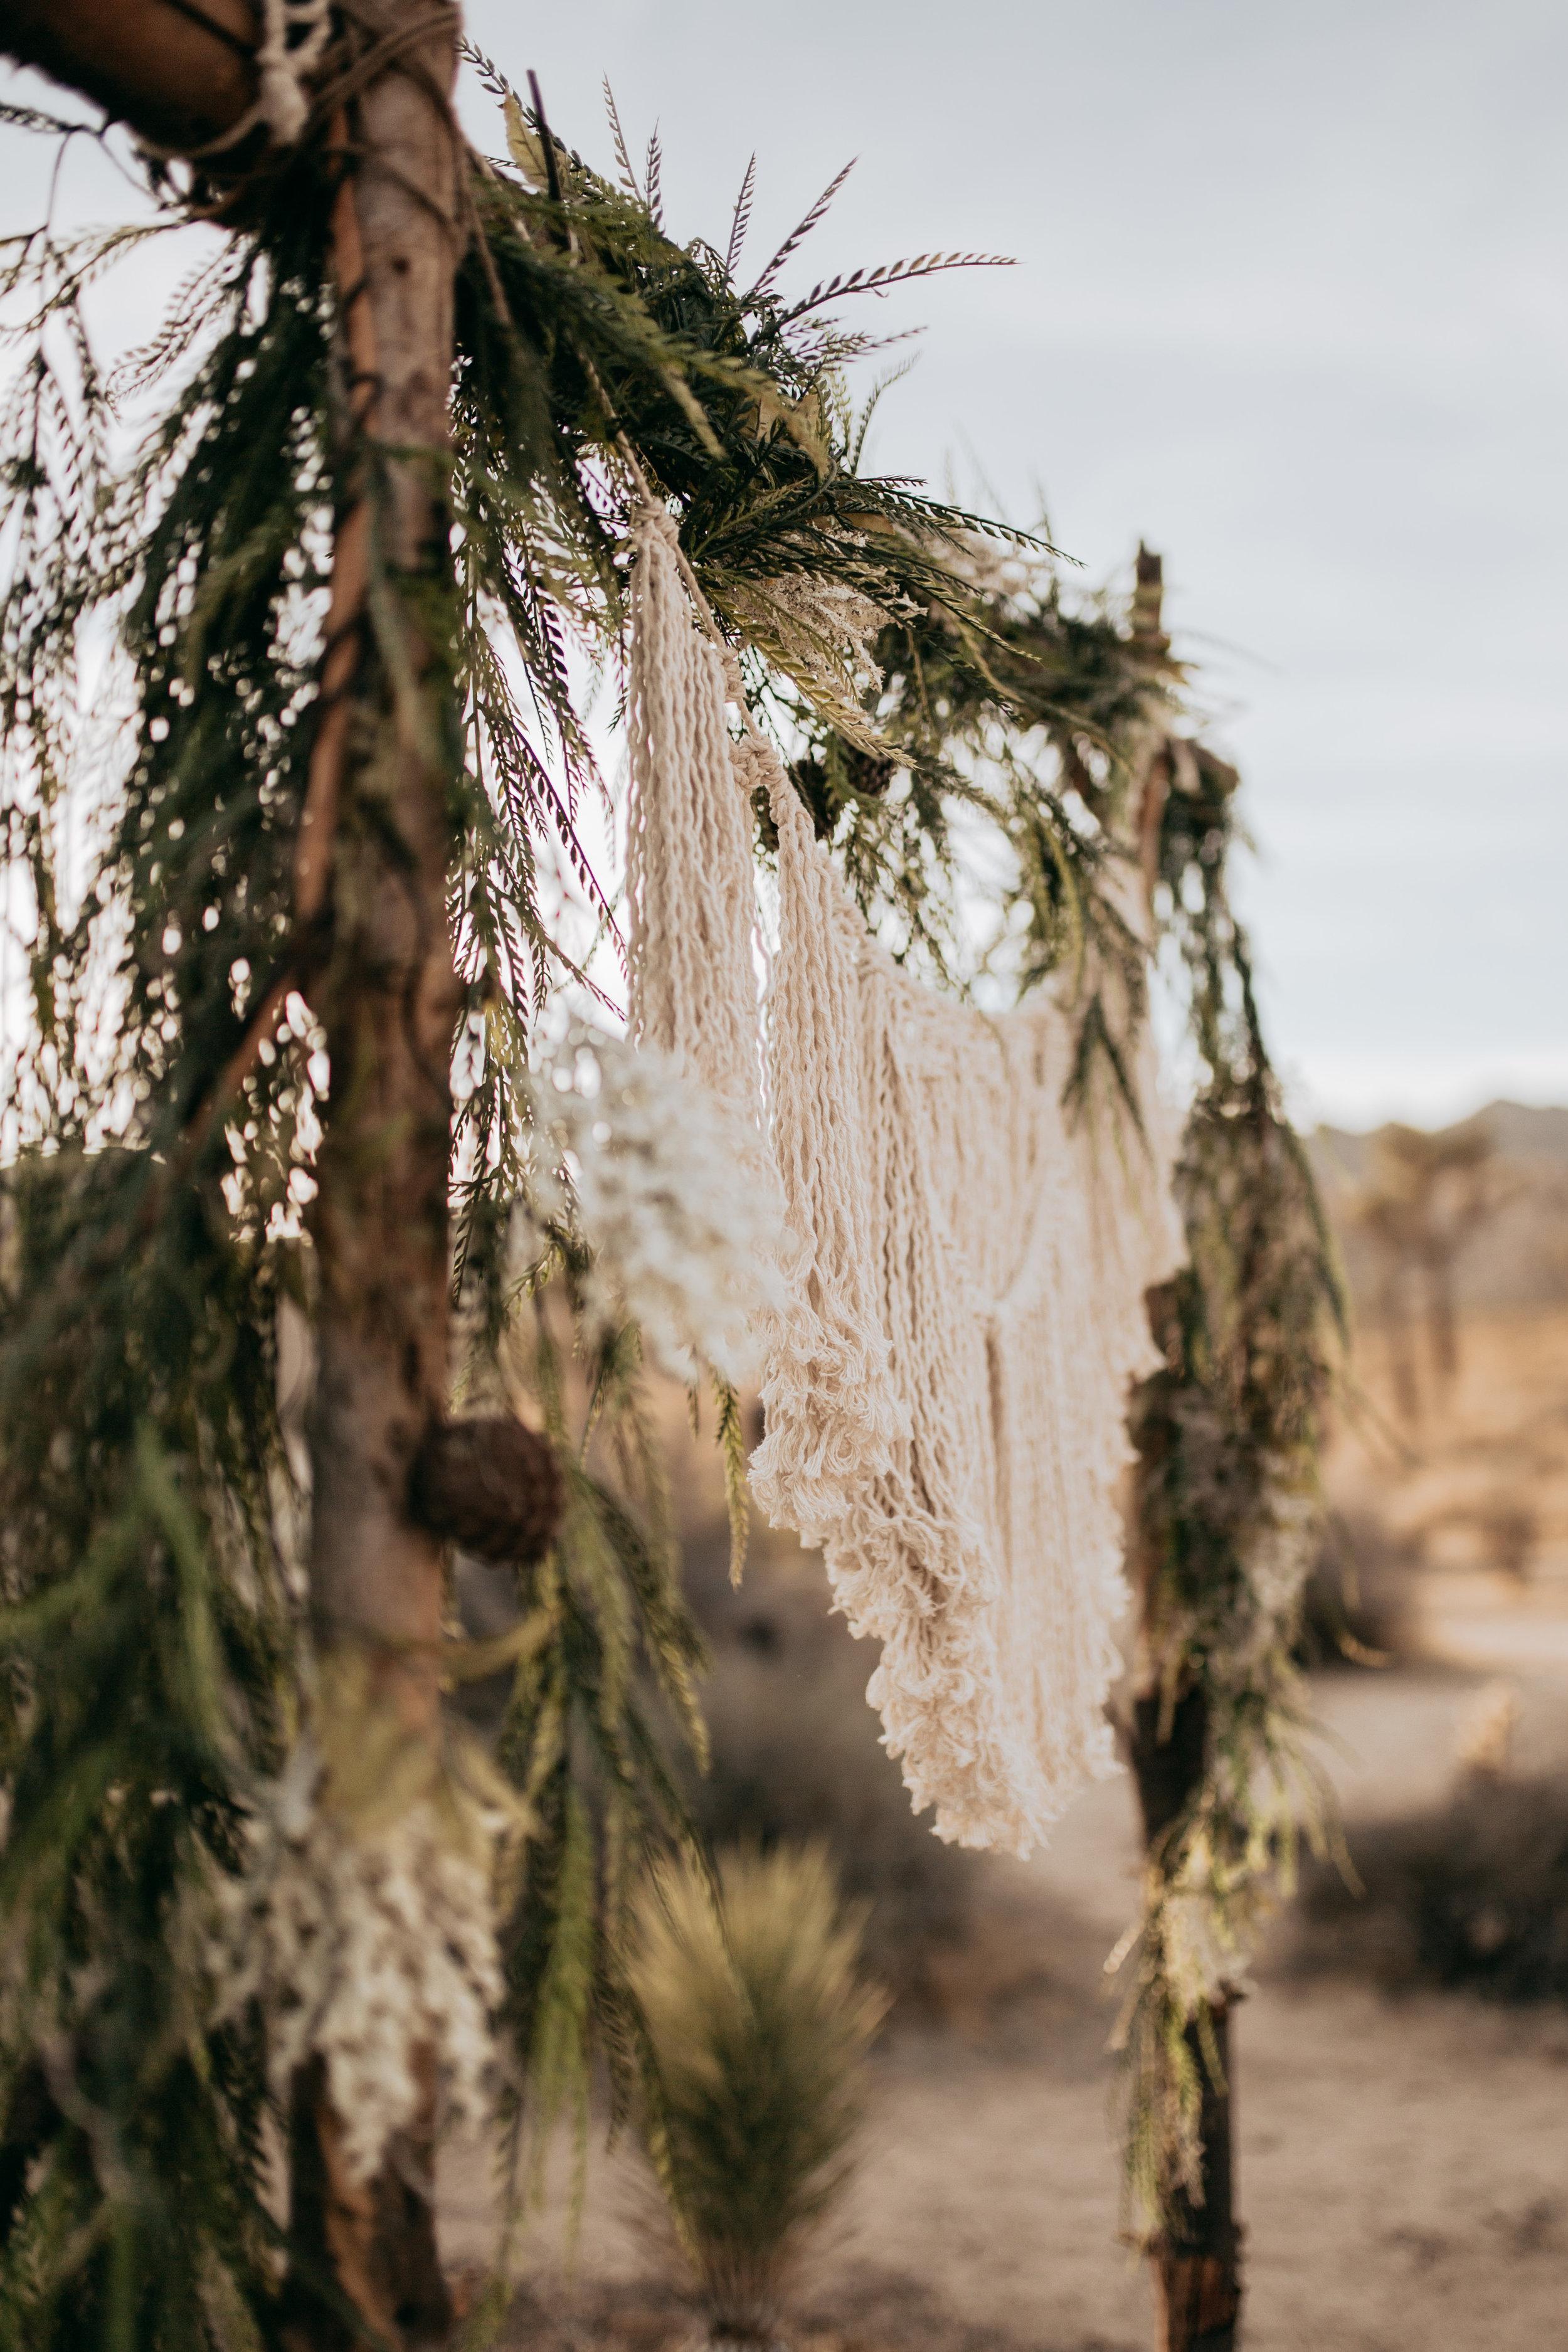 palmsprings_joshuatree_california_wedding_photographer-2.jpg